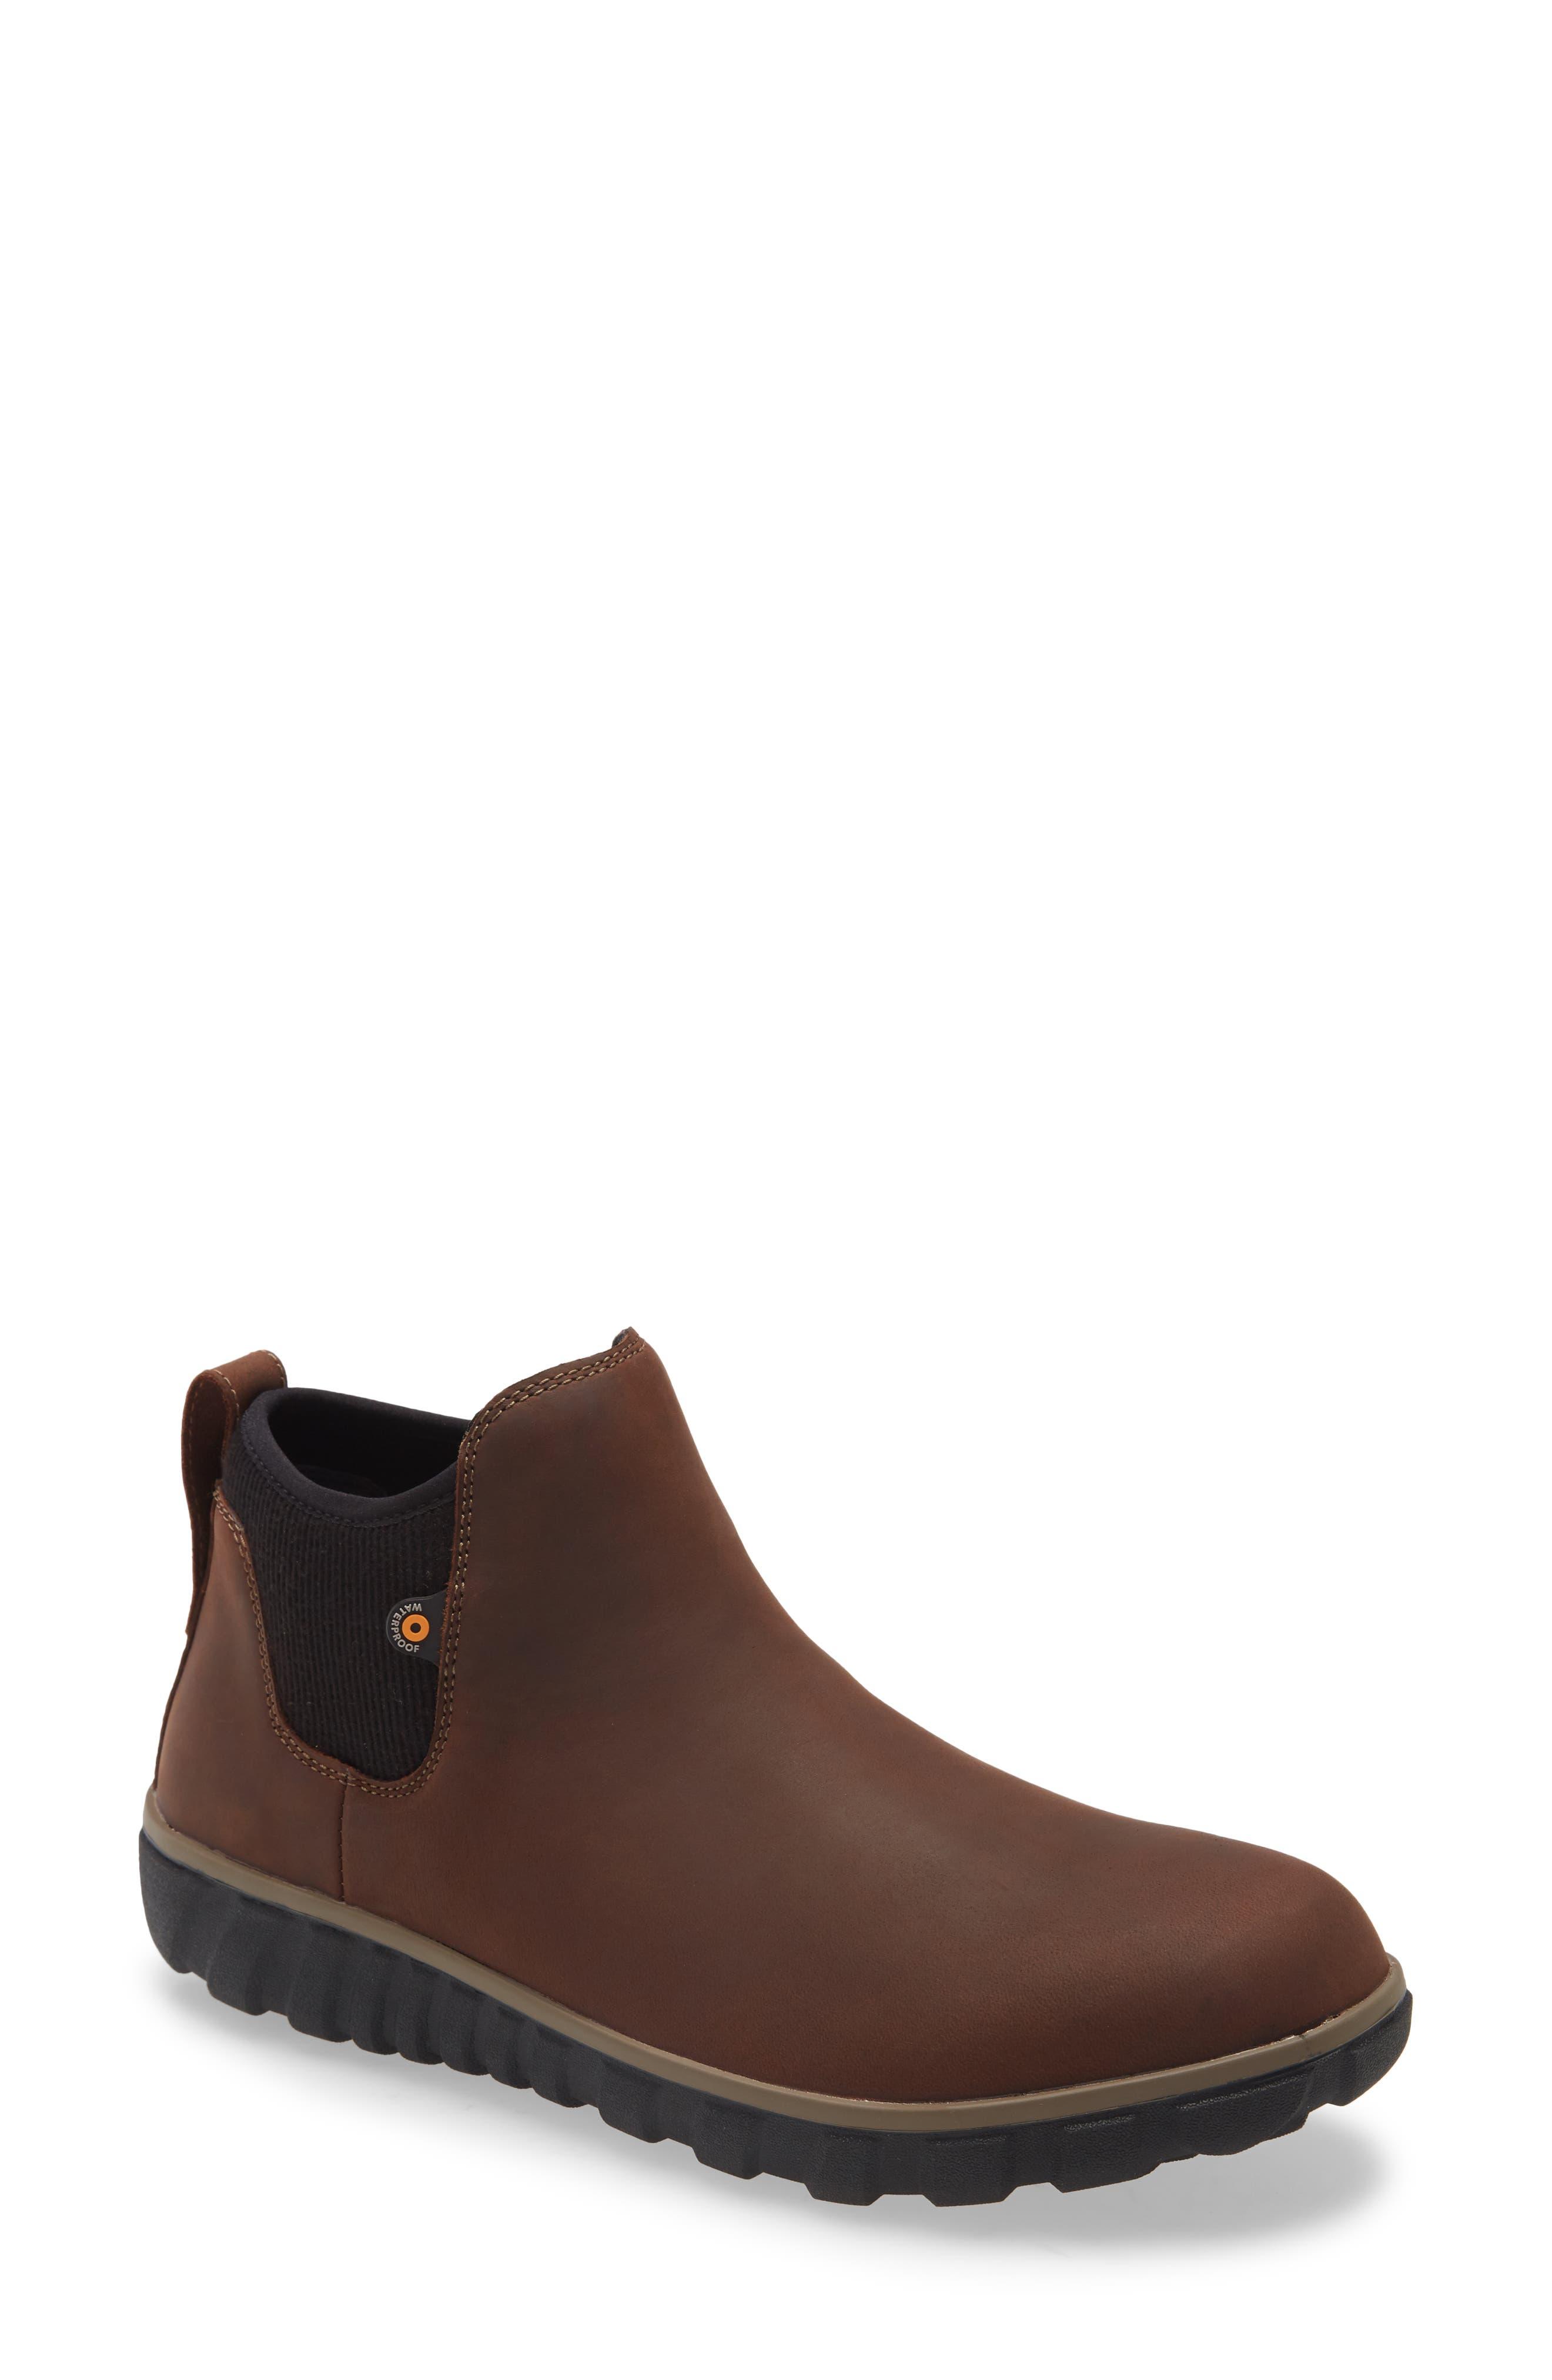 Classic Casual Waterproof Chelsea Boot